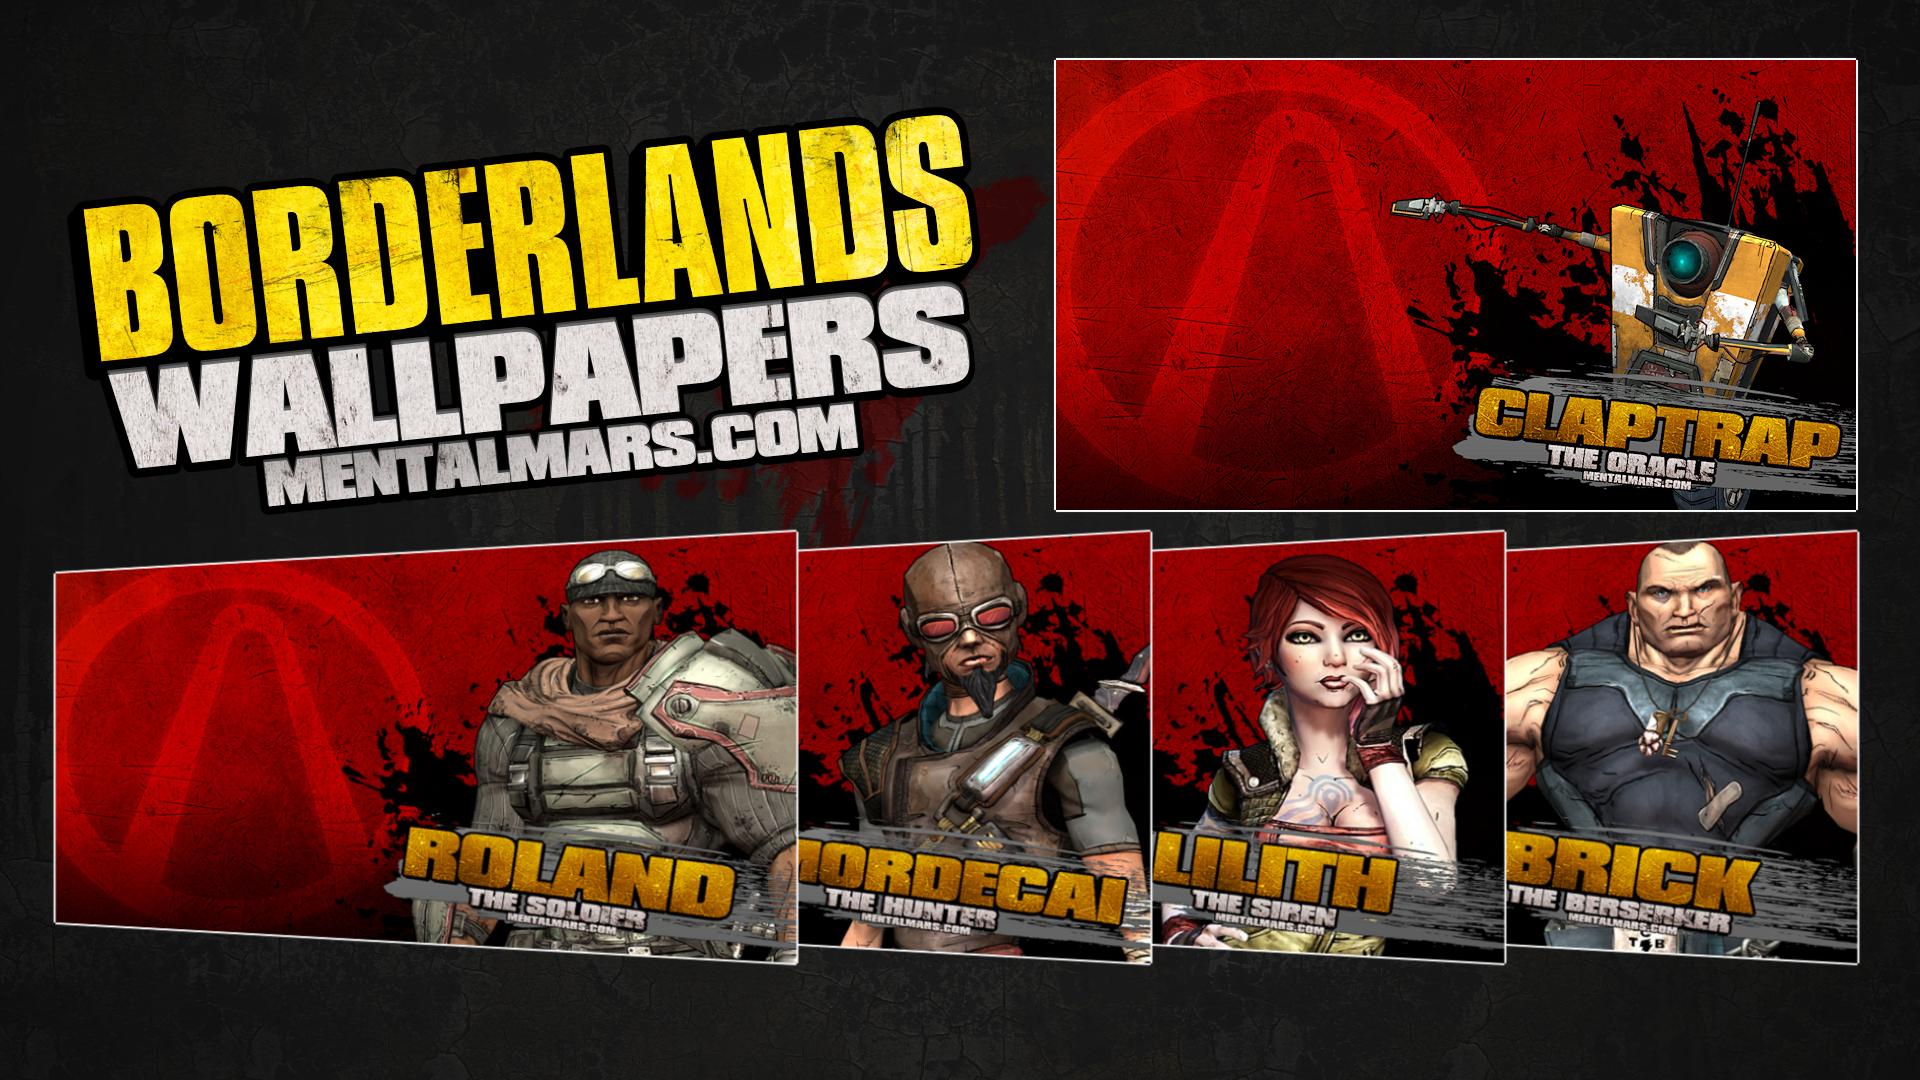 Borderlands 1 Splatter Wallpapers